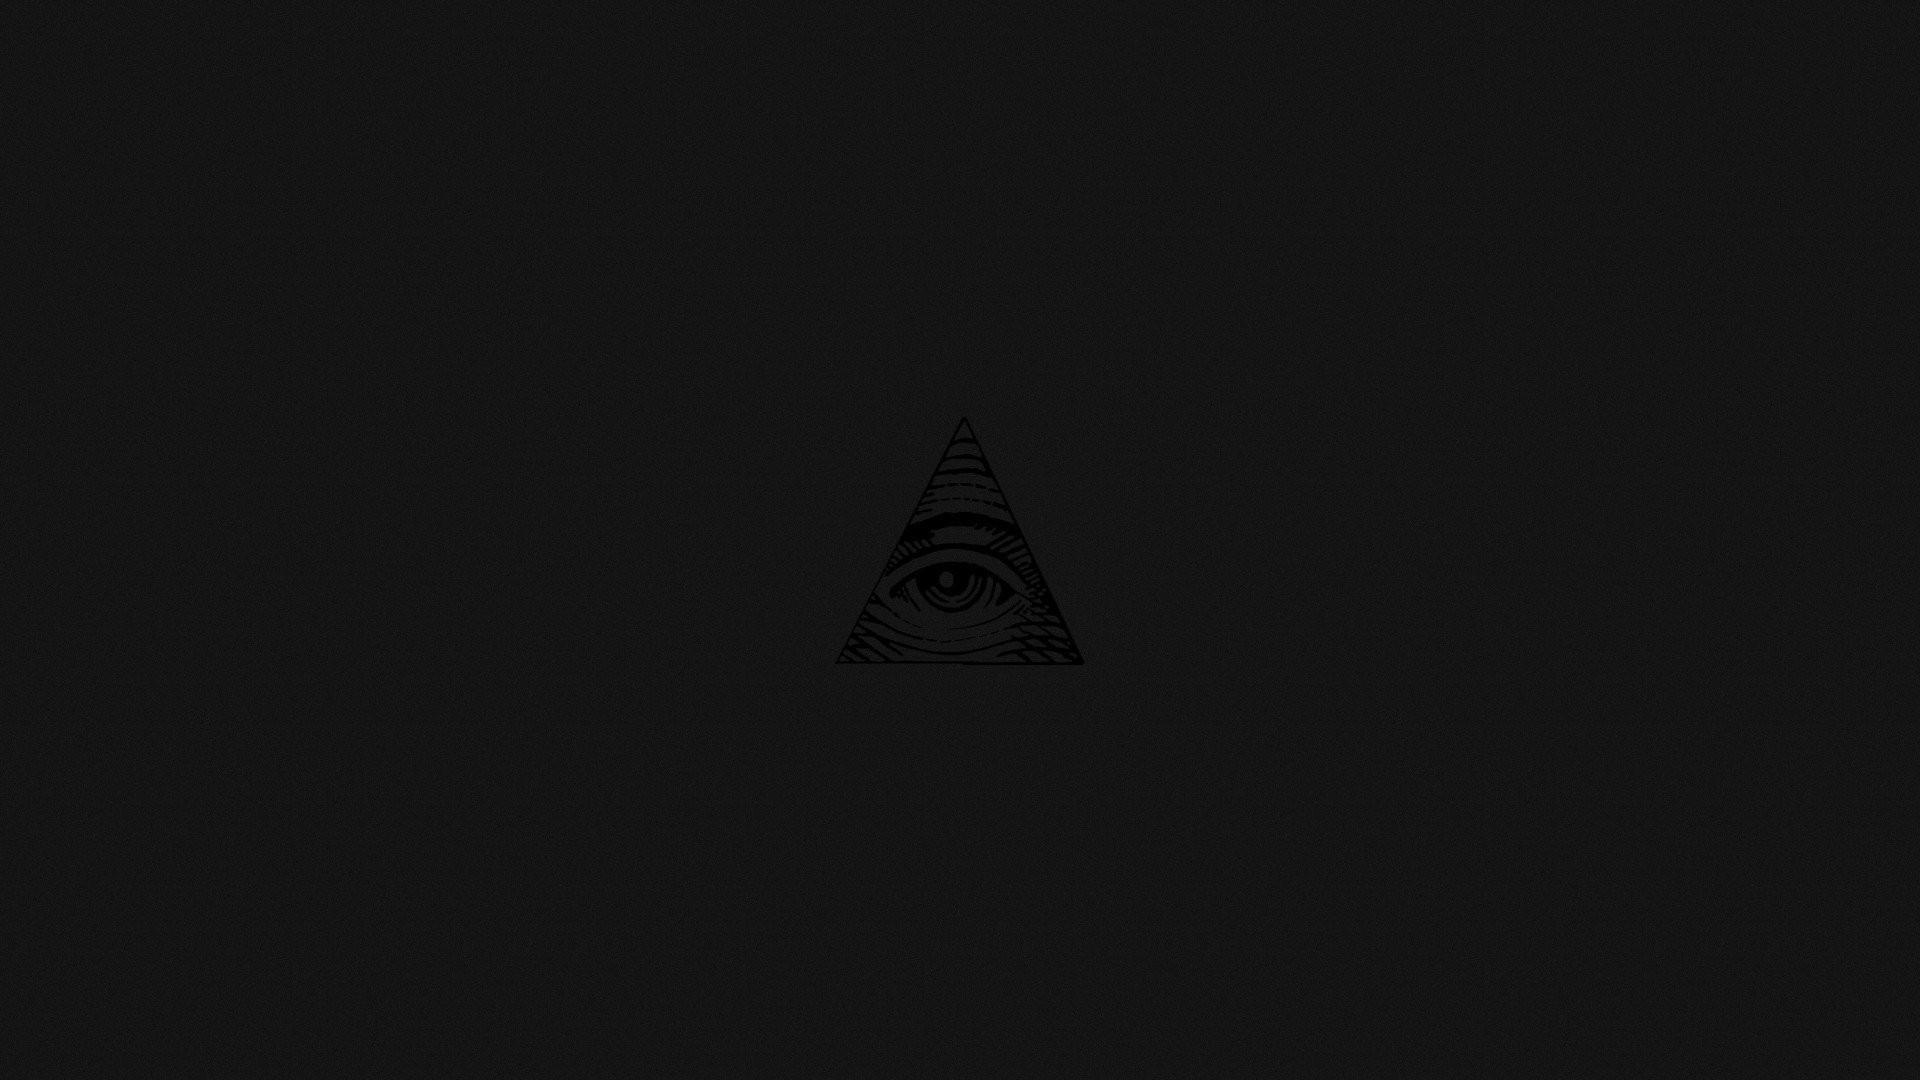 Gravity Falls Mobile Wallpaper Illuminati Wallpapers 74 Pictures